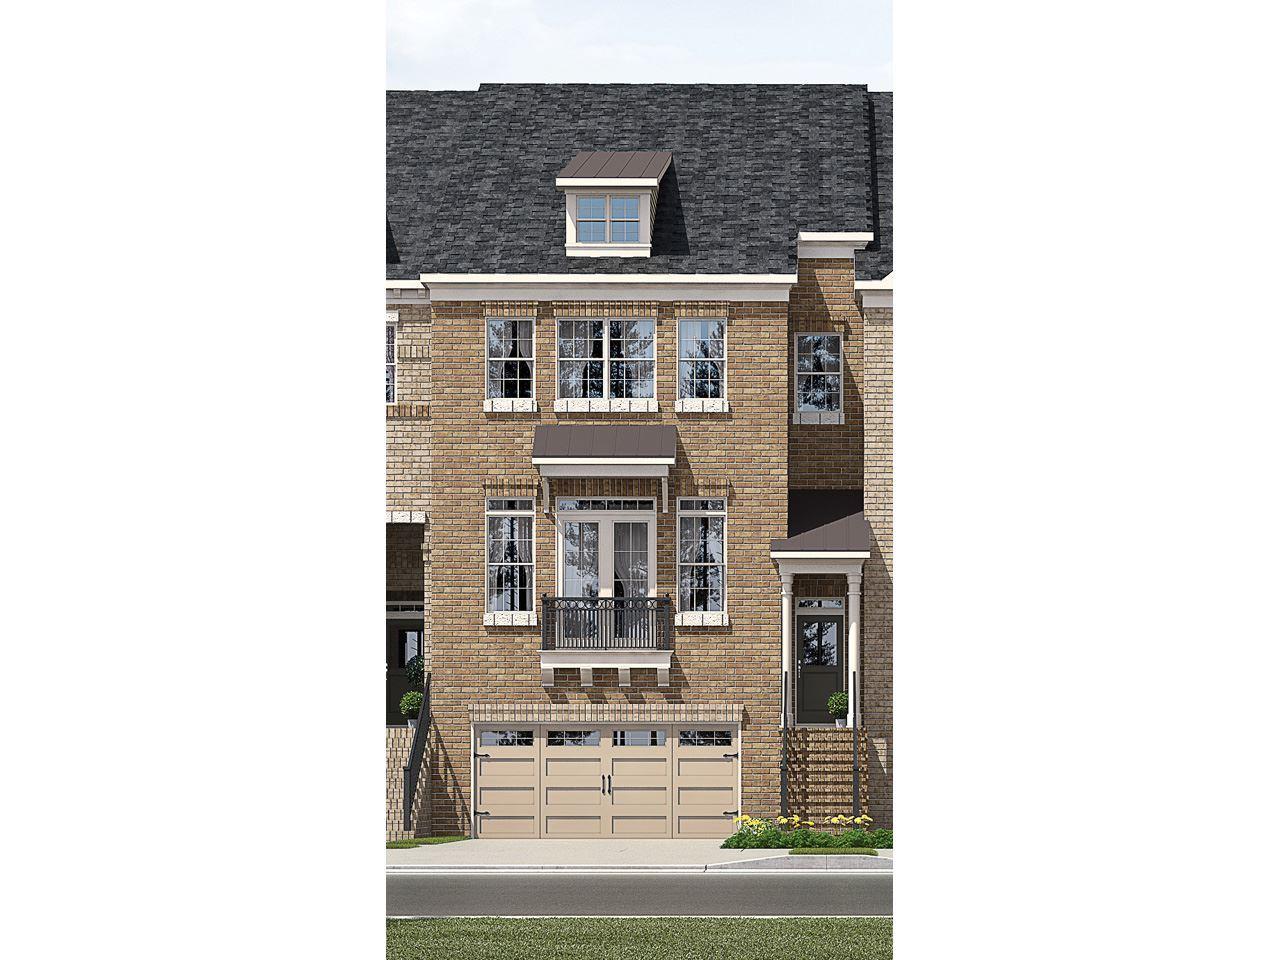 2786 AVINGTON LANE, Vinings, GA Homes & Land - Real Estate